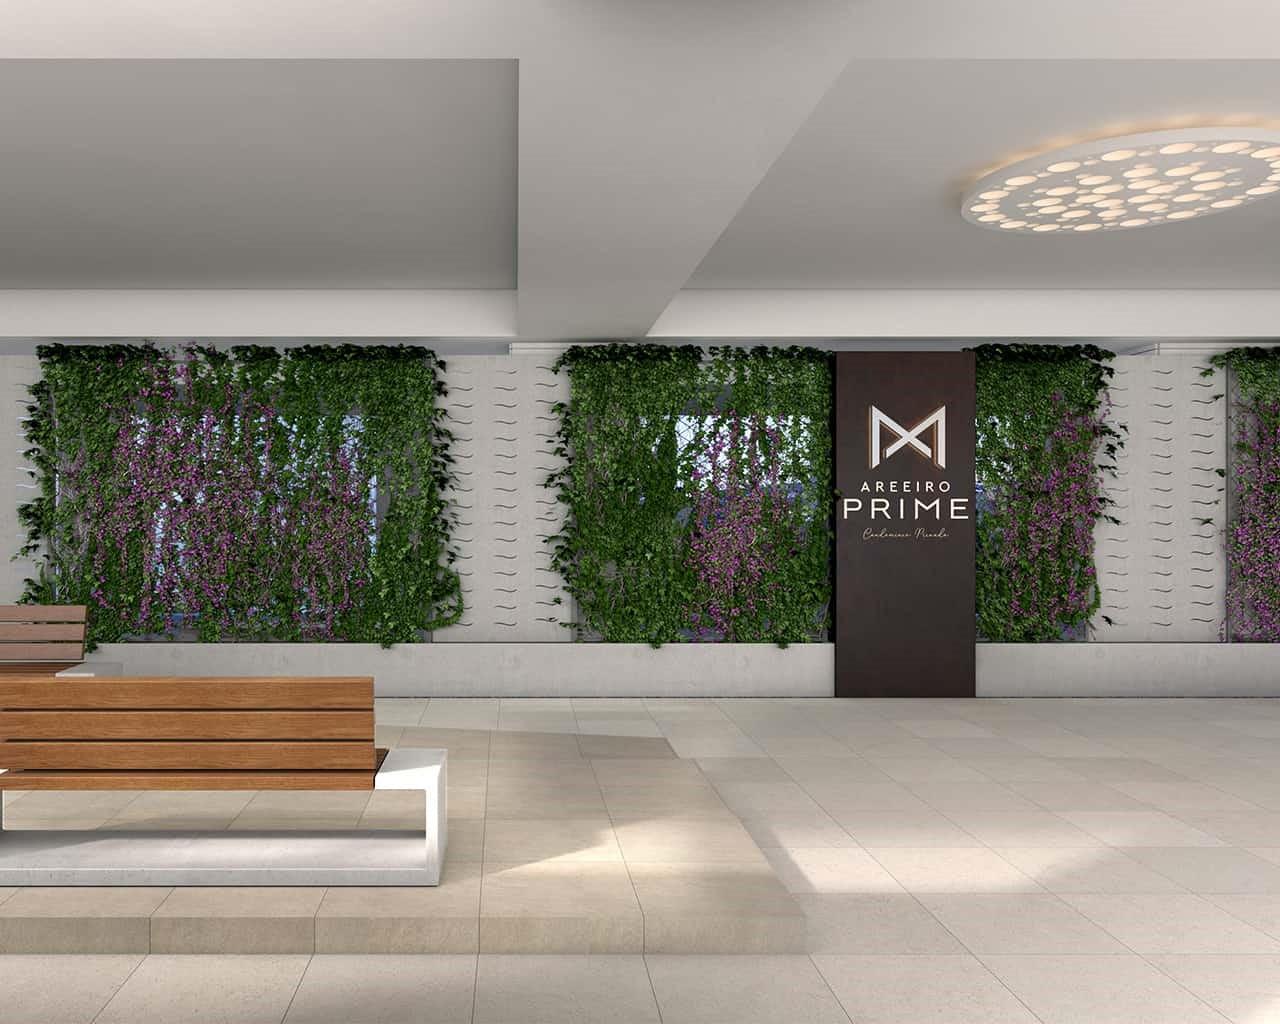 areeiro-prime-lobby-exterior-2